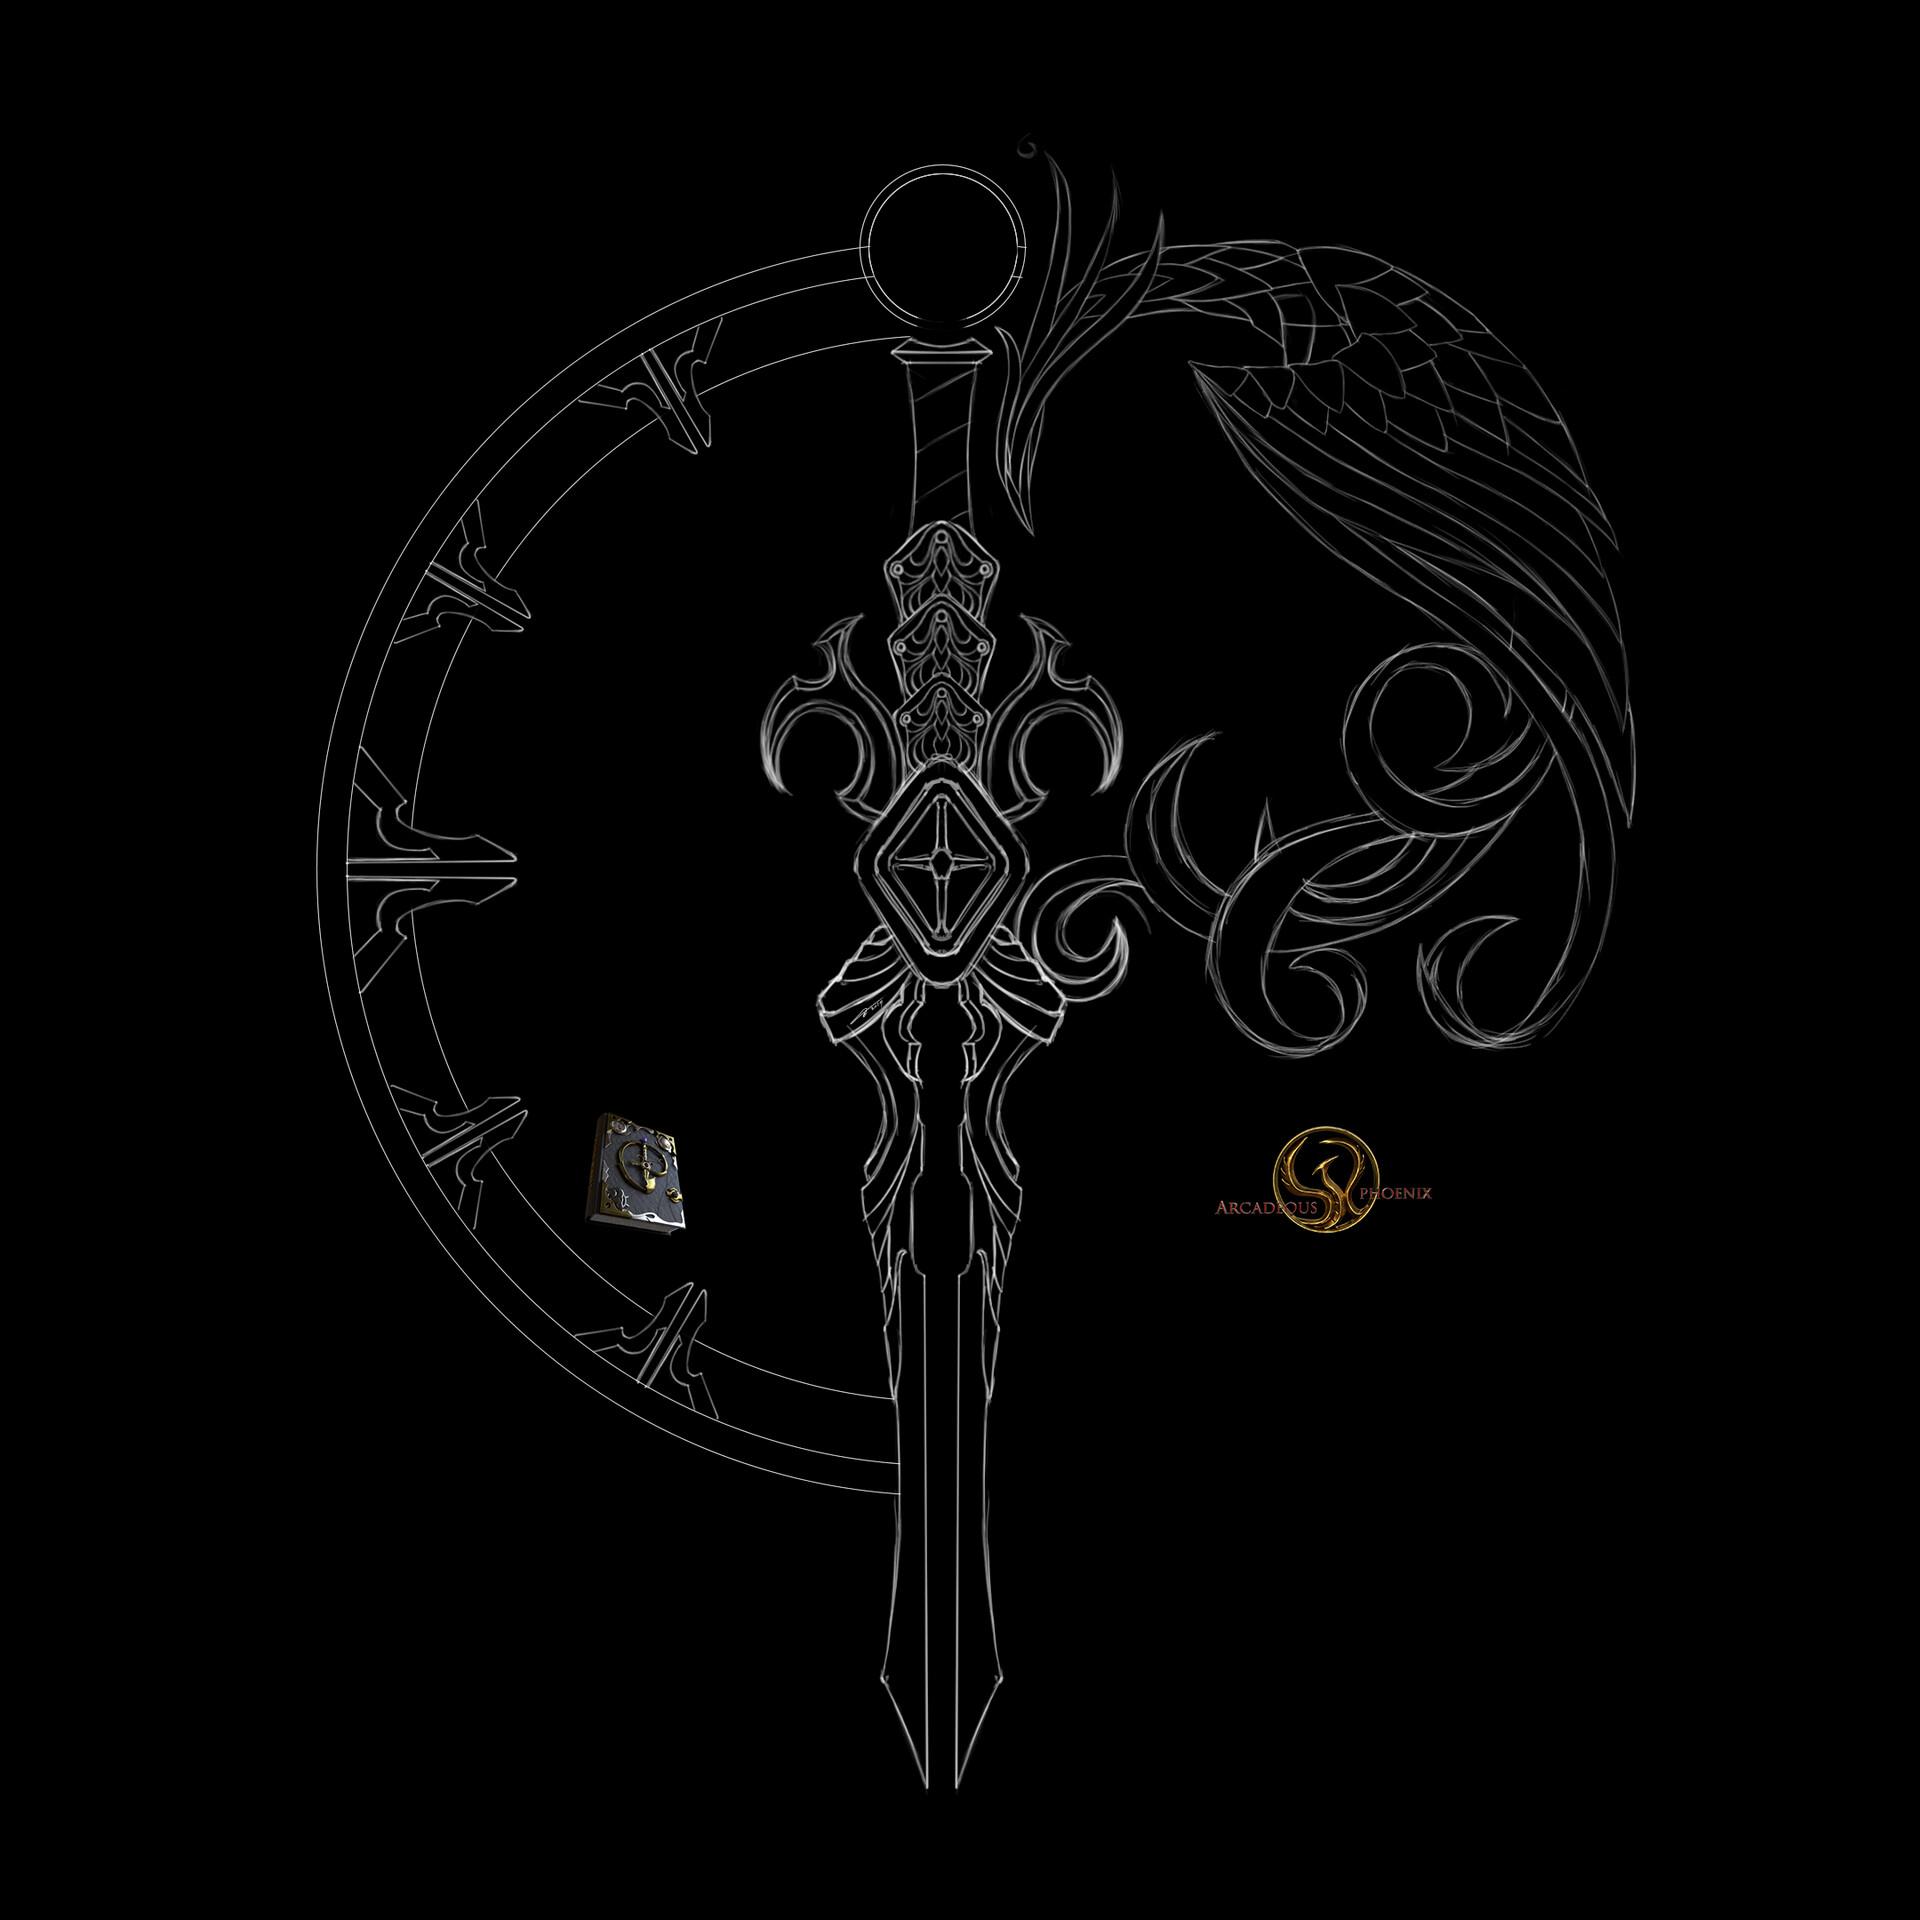 Arcadeous phoenix gp logo 2019